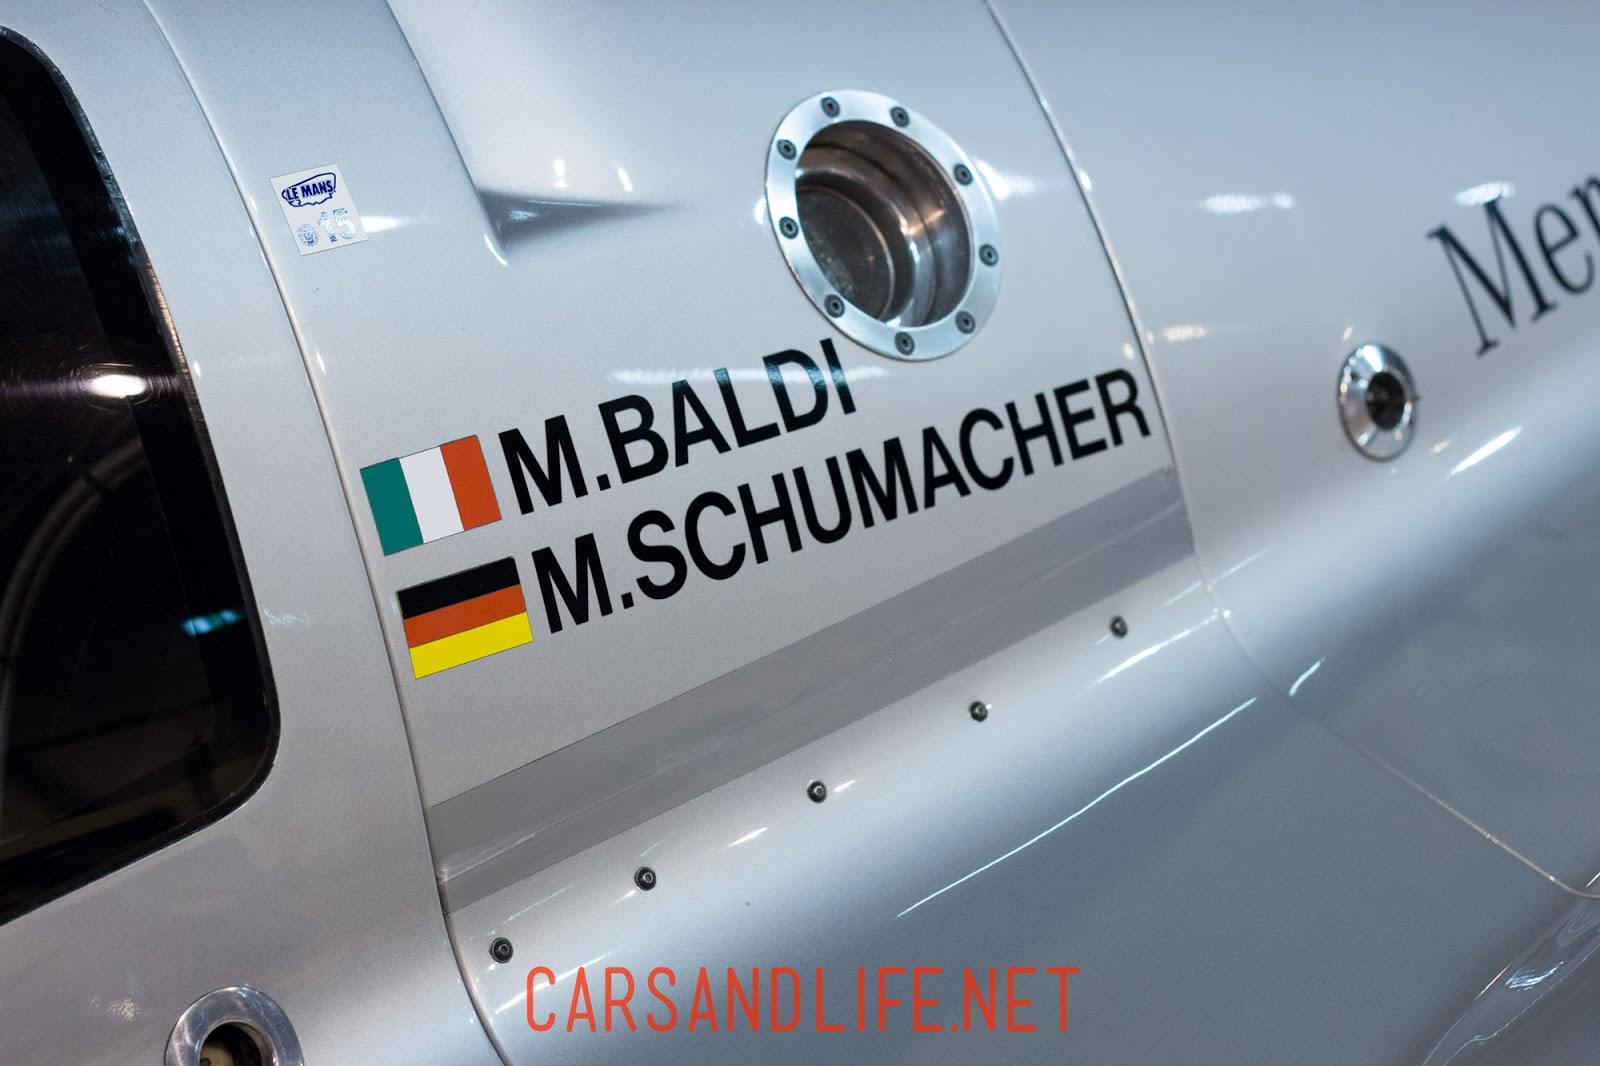 Mercedes-Benz C11 | Schumacher's Group C Car